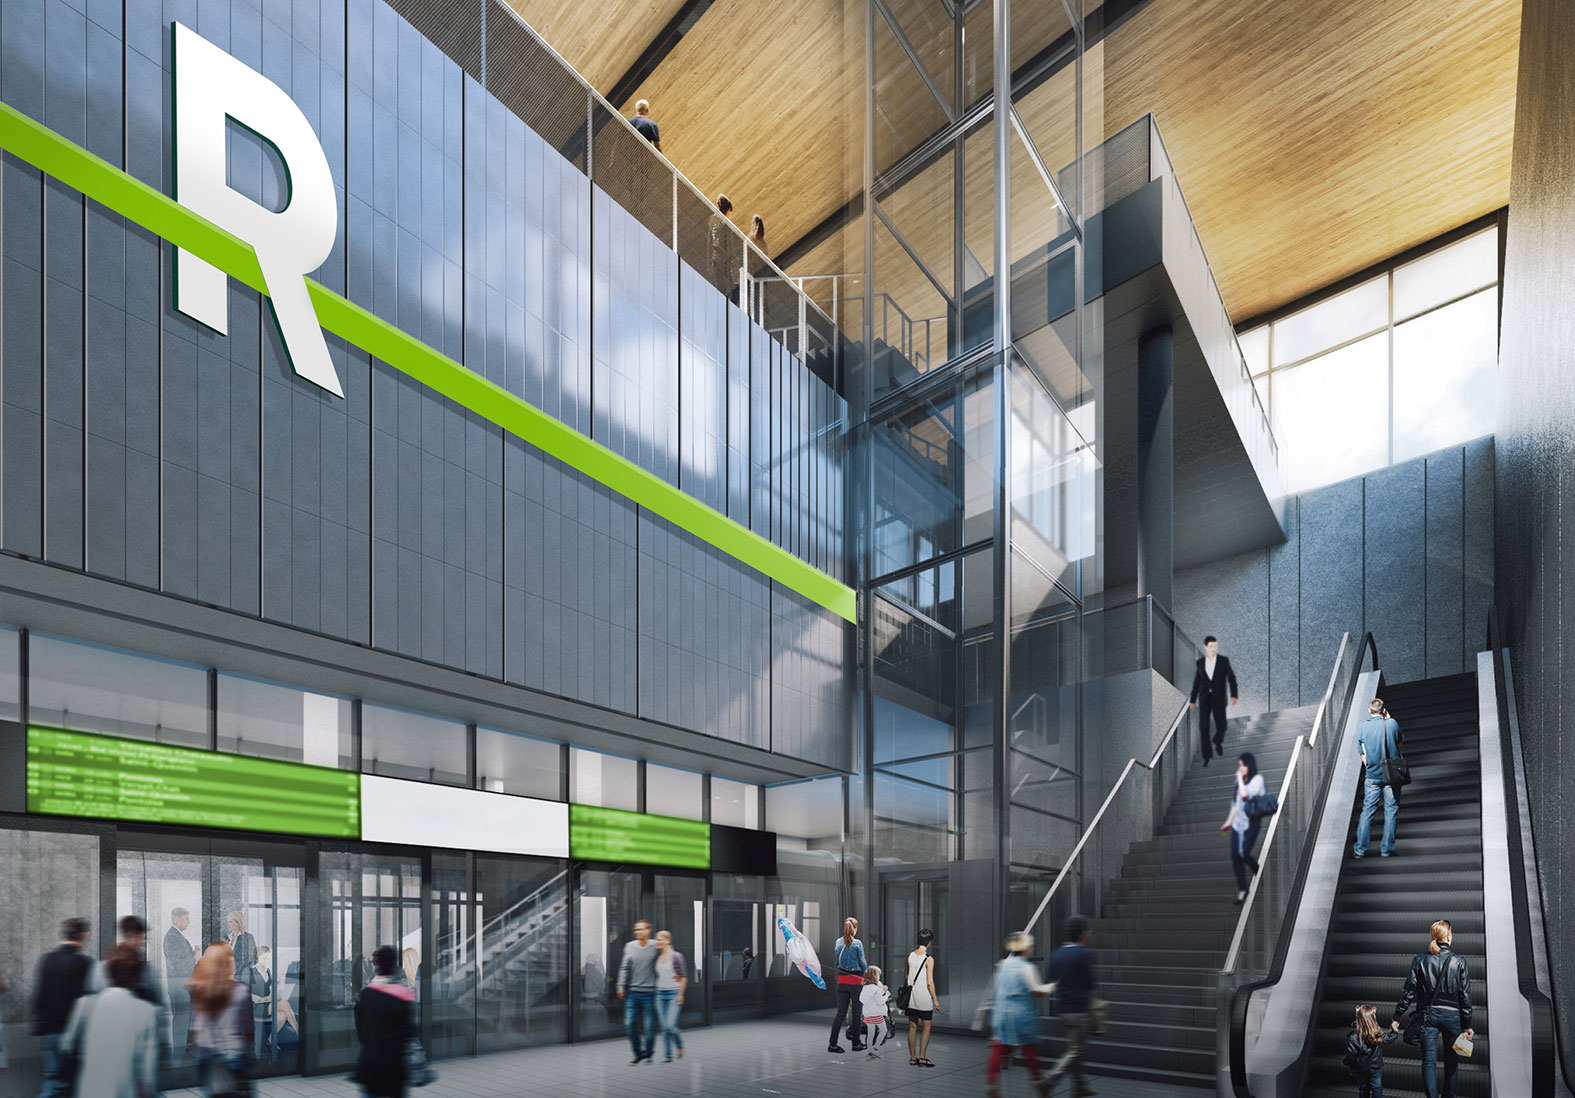 REM_Station_interieur.resize